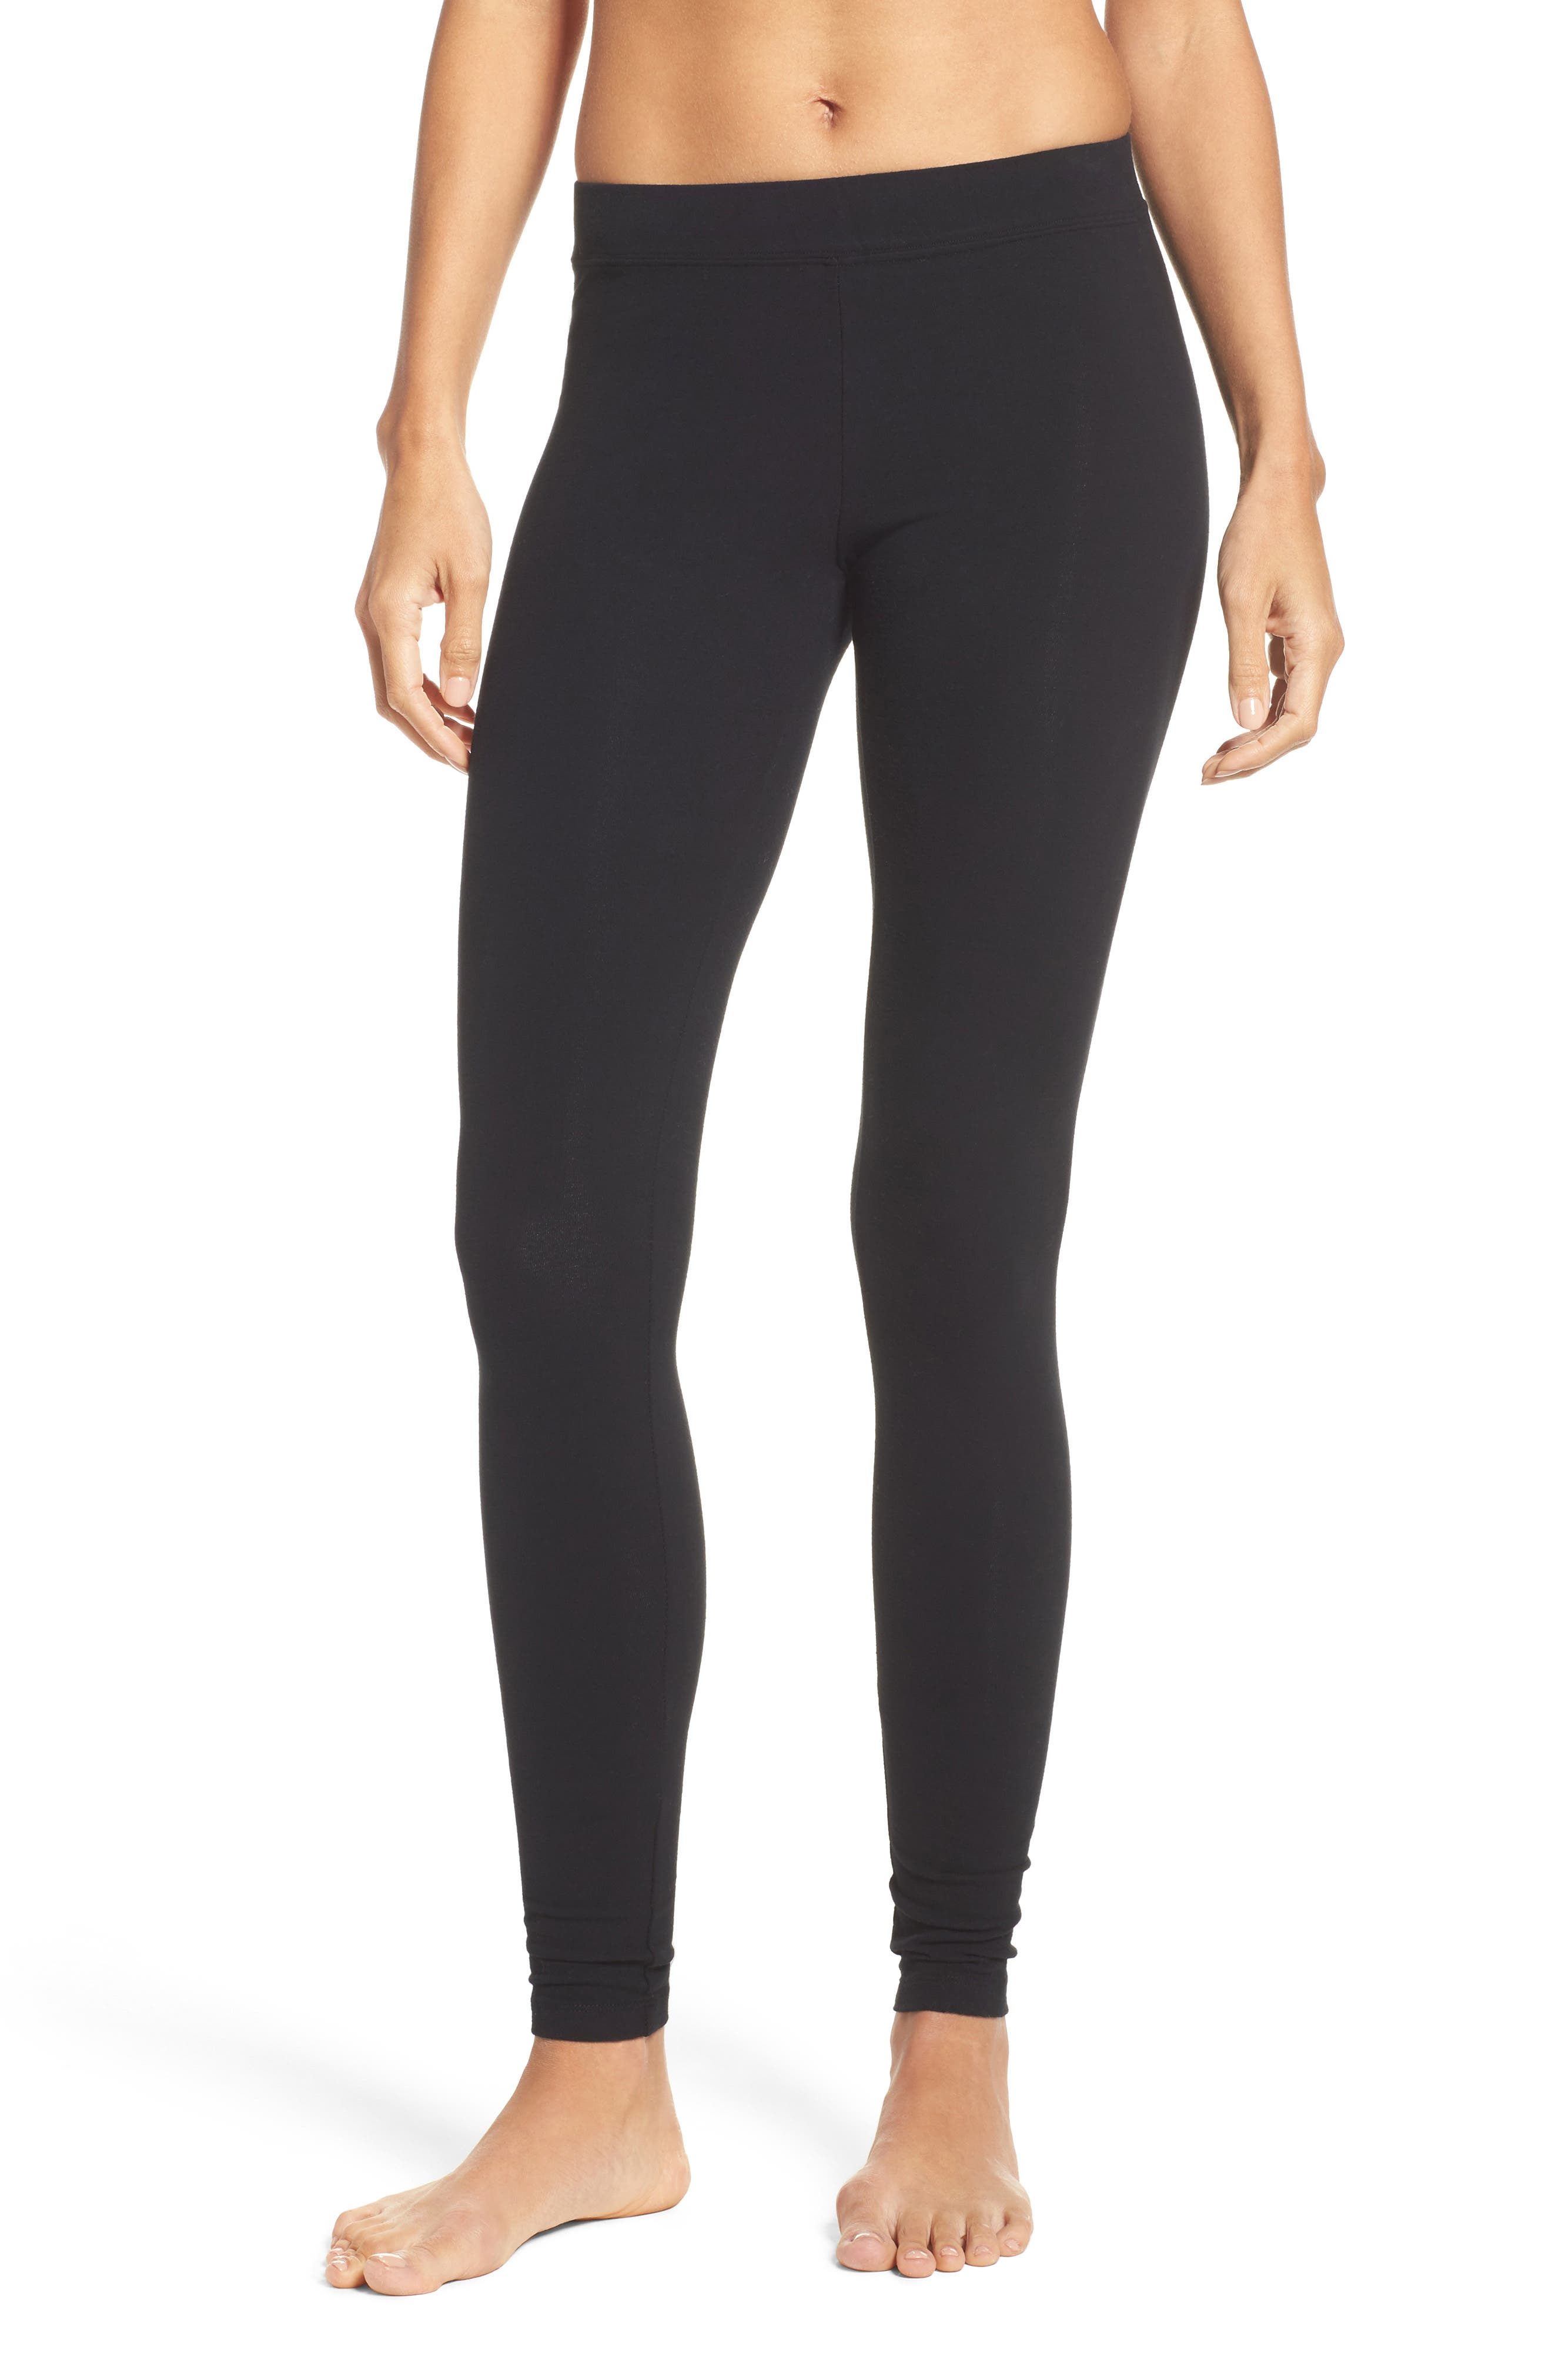 Stretch Leggings,                         Main,                         color, Black